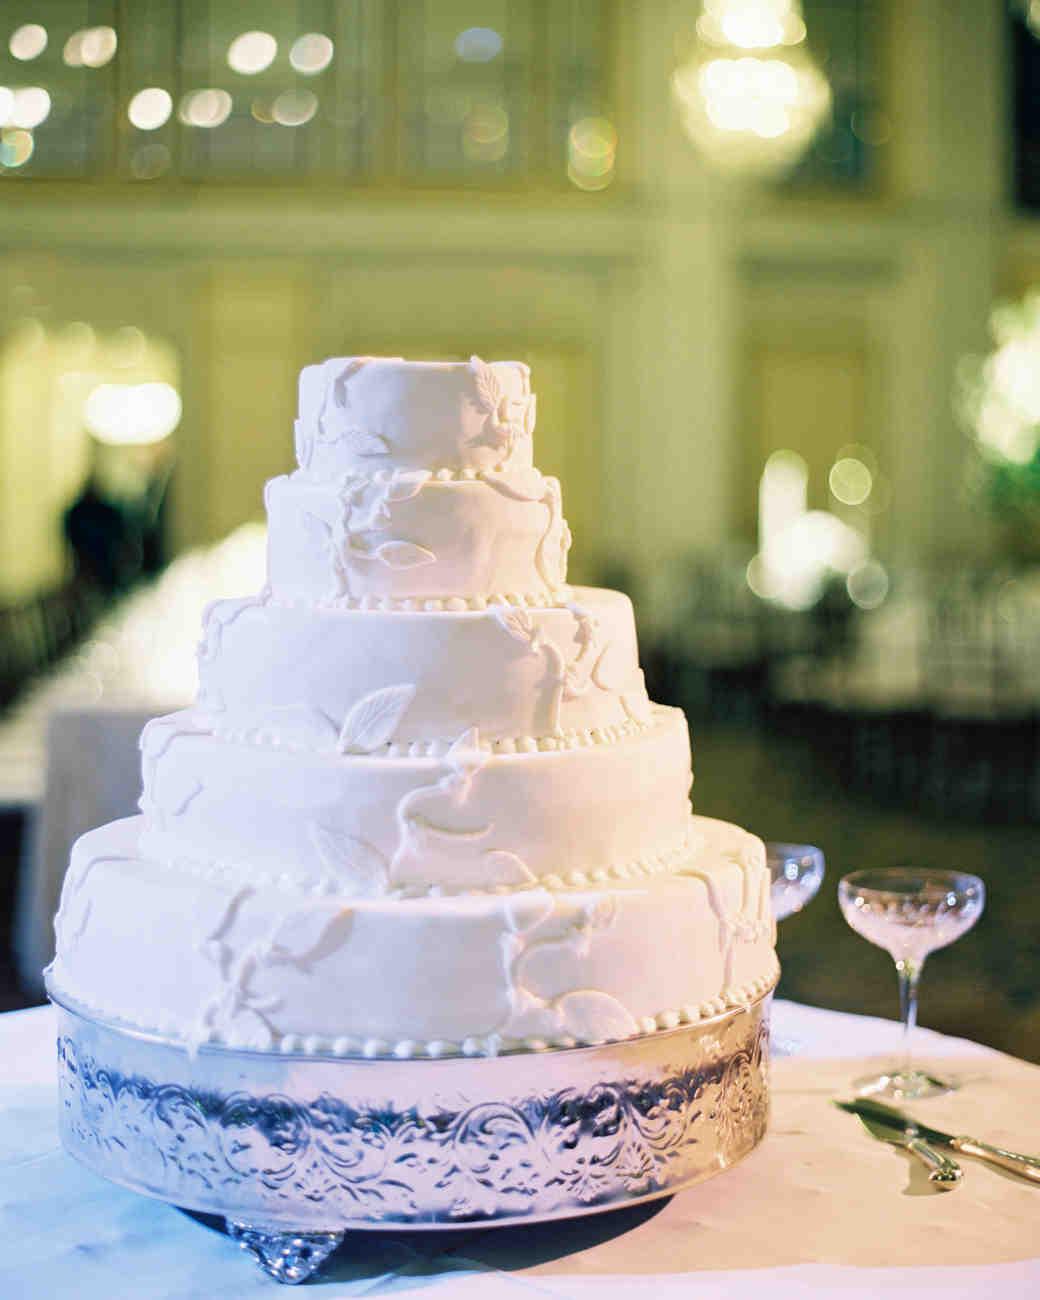 taylor-john-wedding-cake-499-s112507-0116.jpg